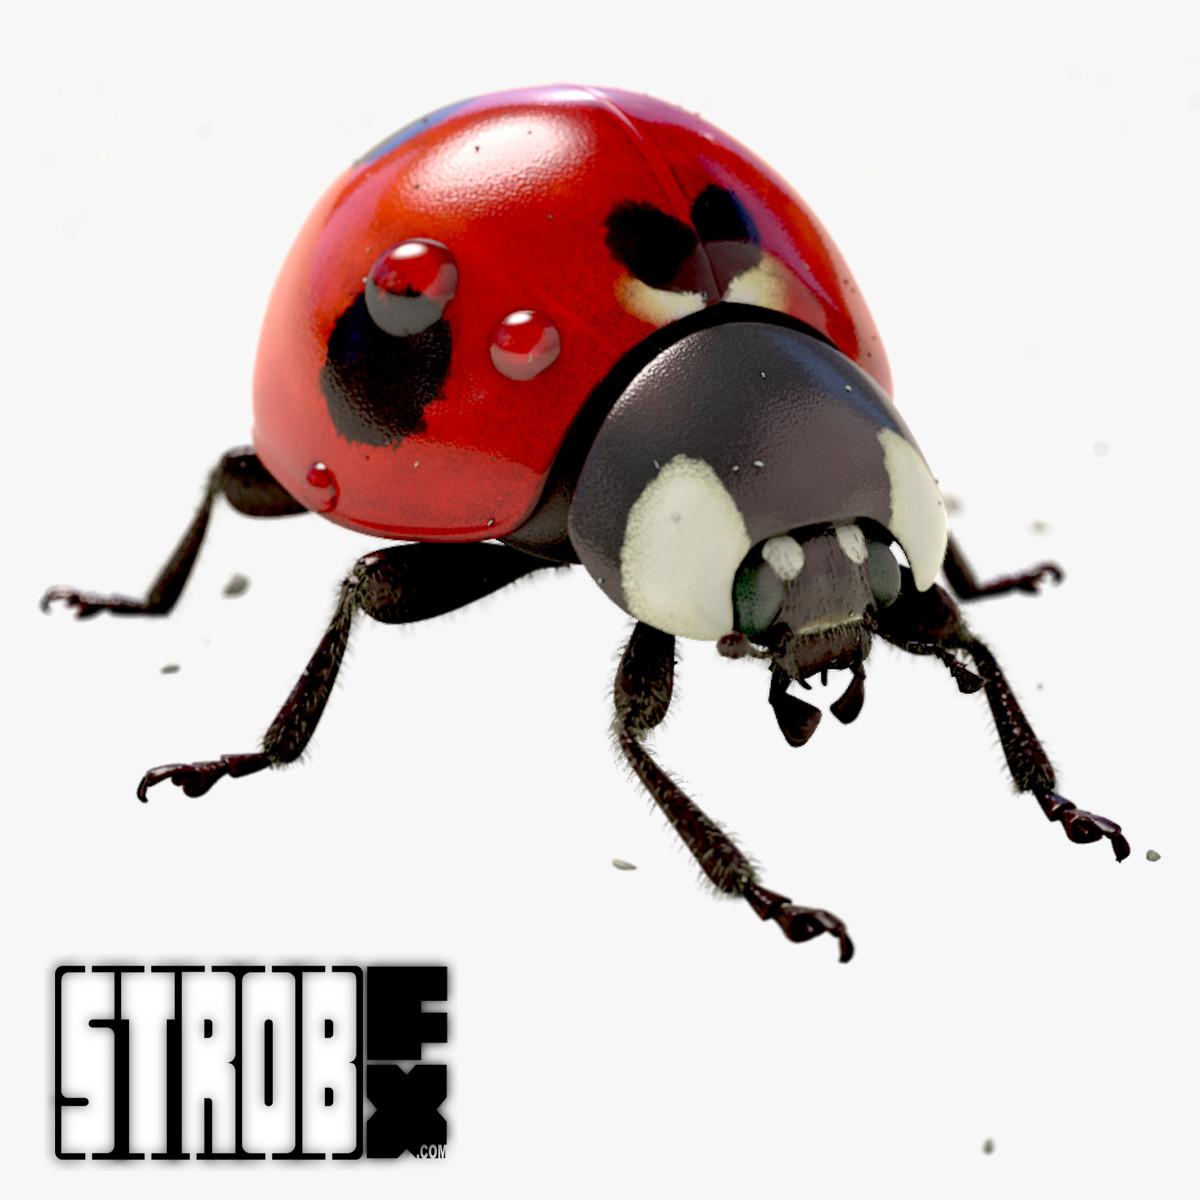 ladybugAnimatedVRfur_a_v001.jpg